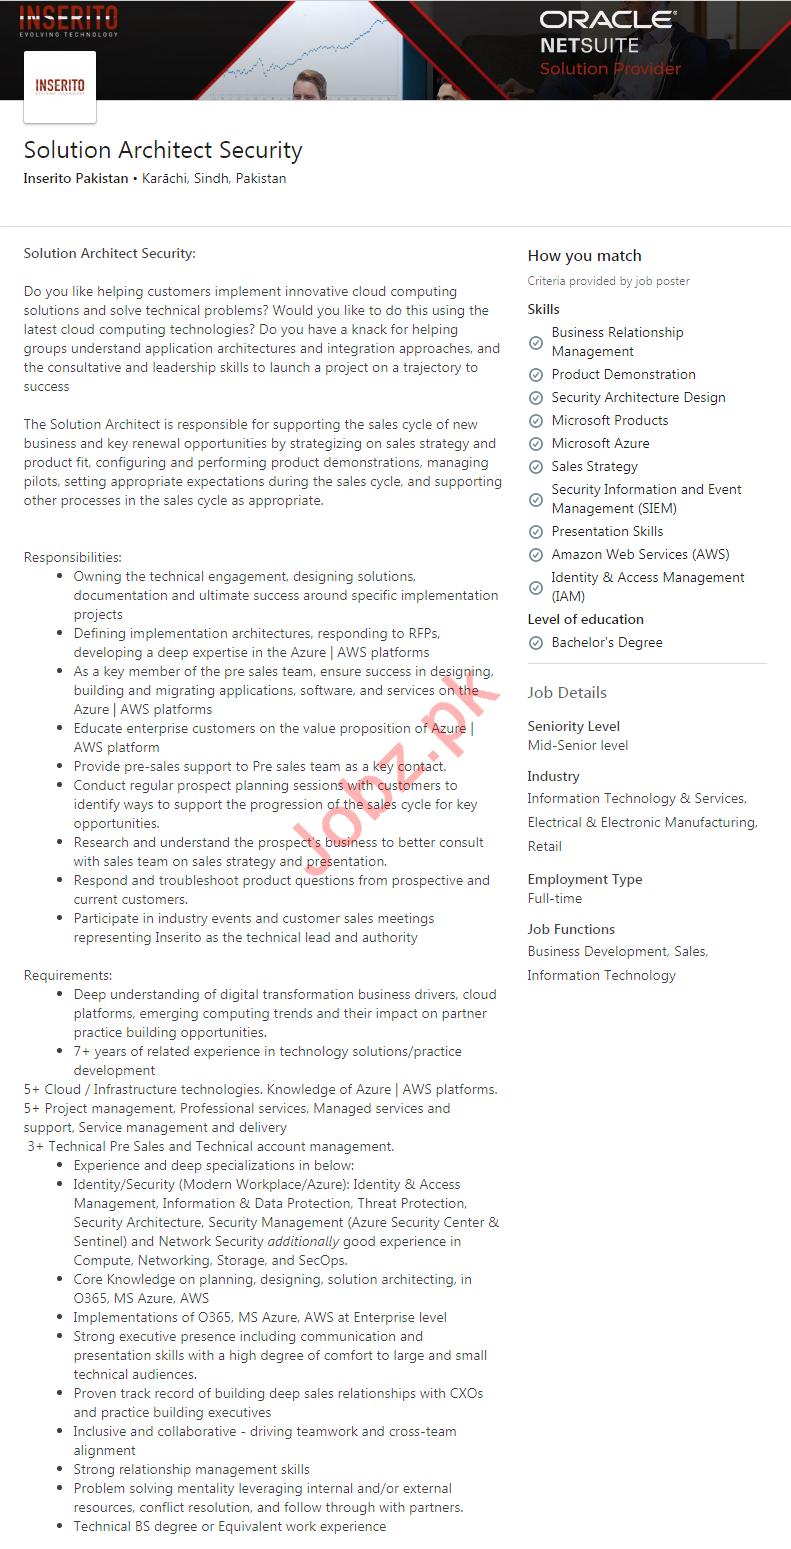 Inserito Pakistan Software Company Jobs 2020 in Karachi